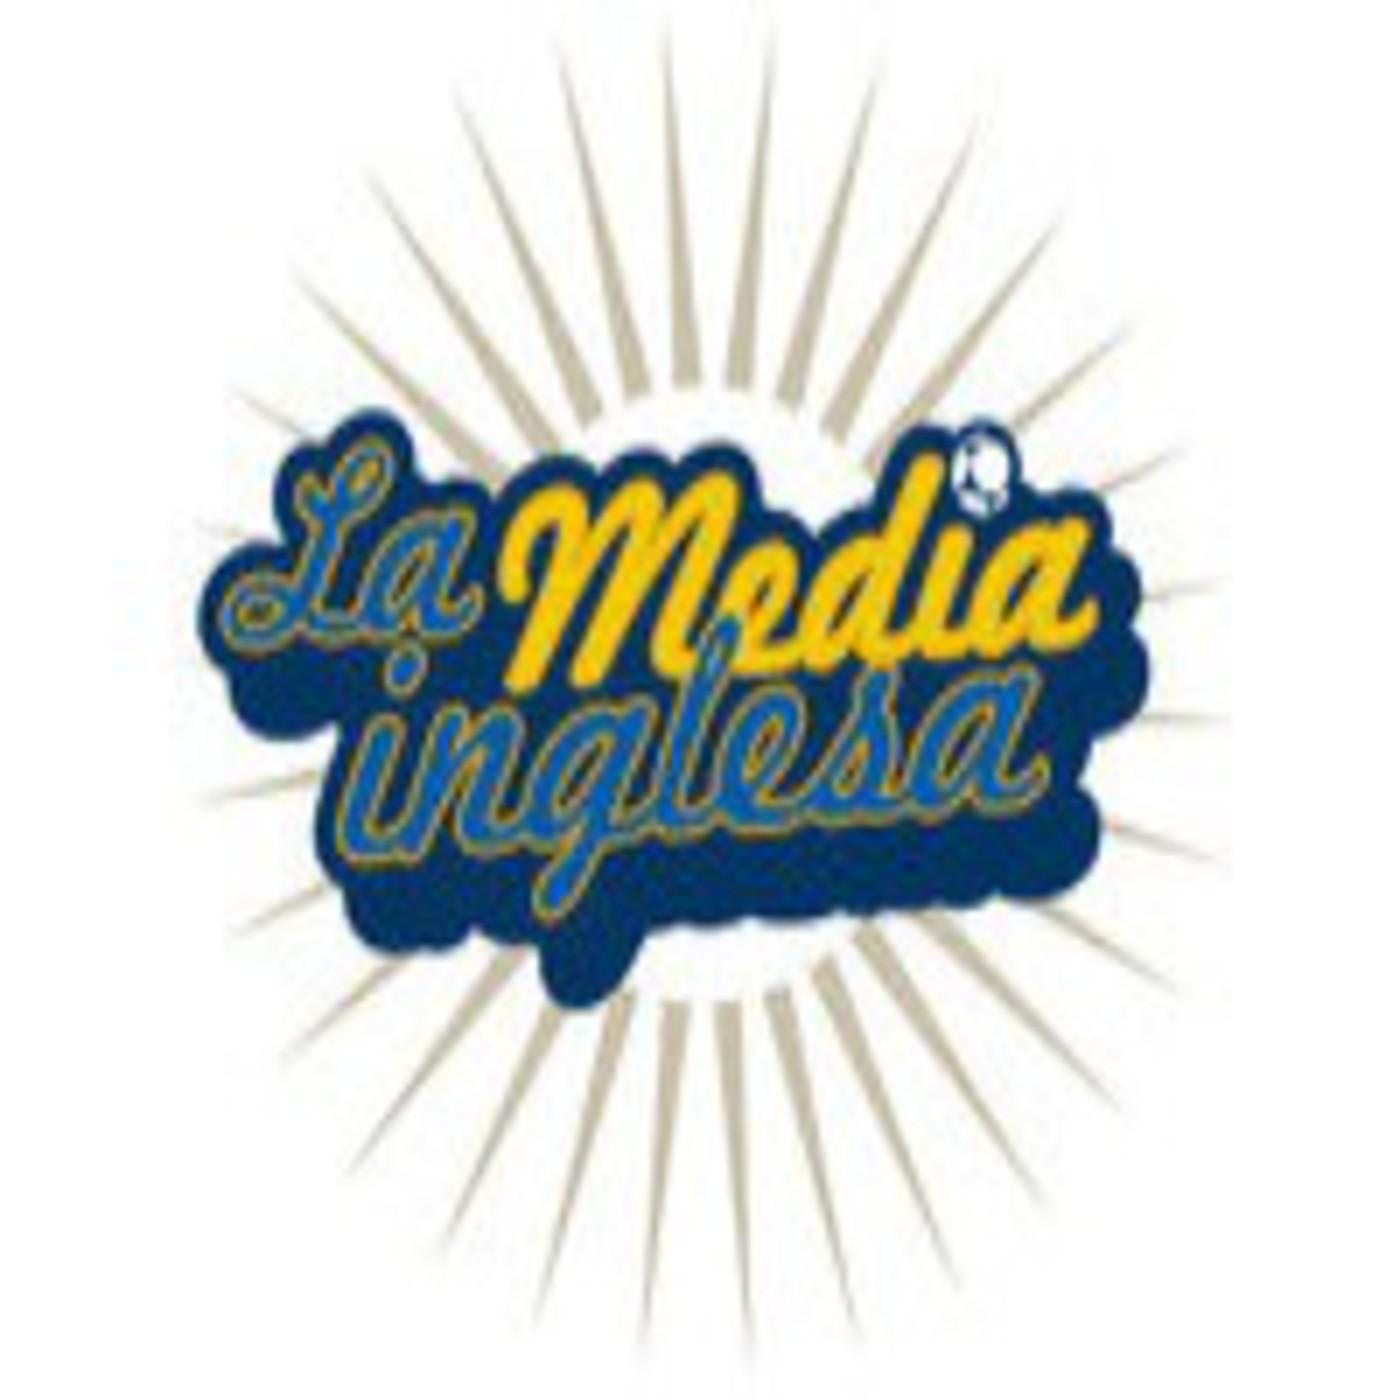 Podcast 28 de La Media Inglesa (22/4/13)